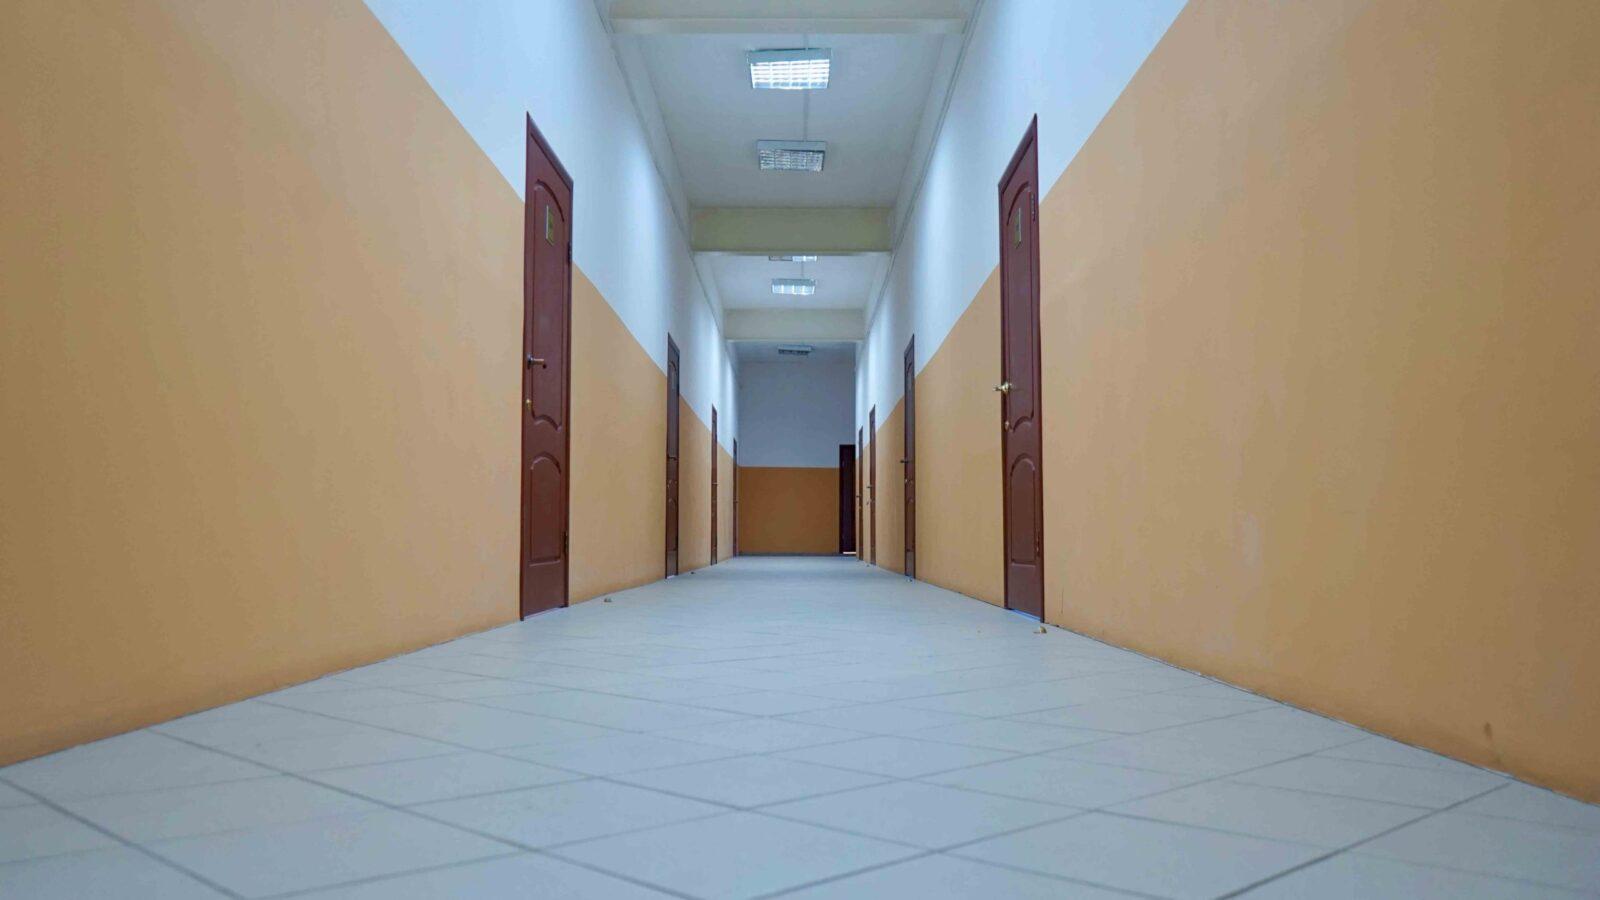 gallerySlide2